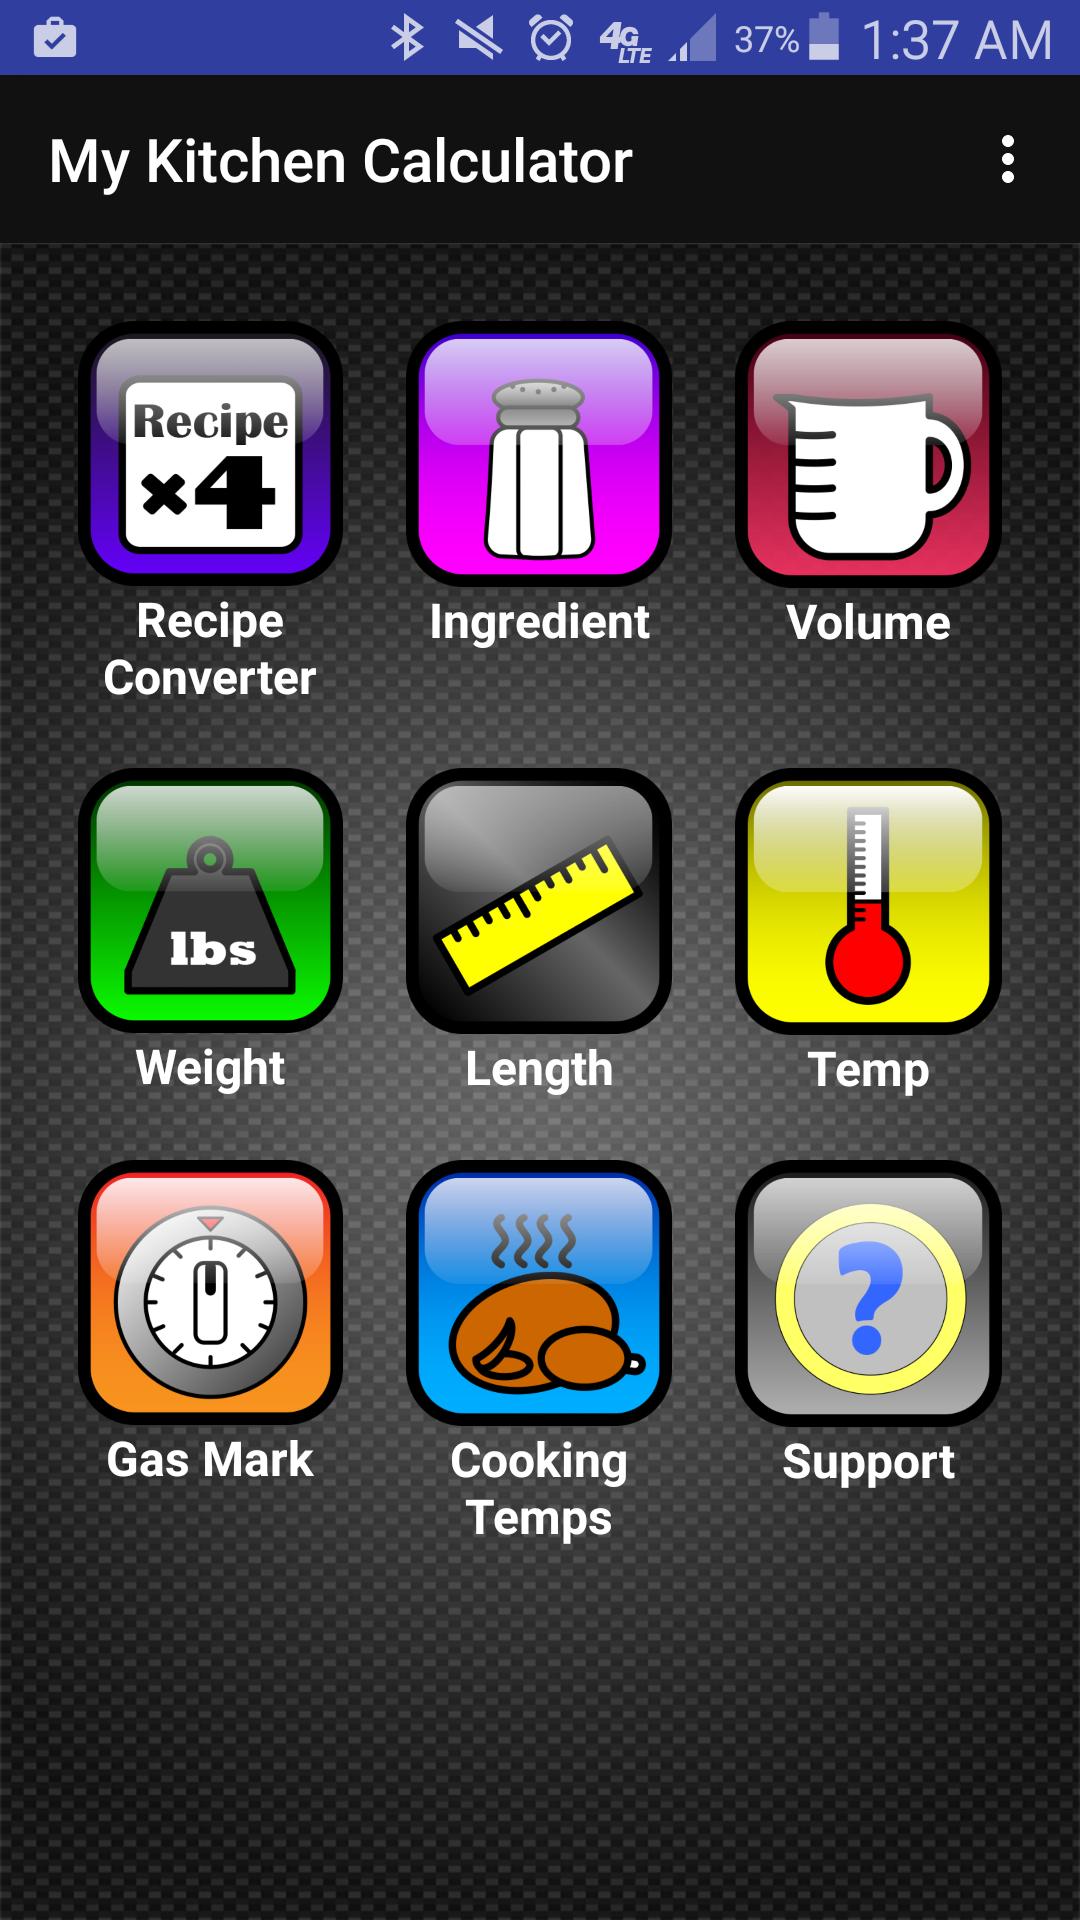 Amazon.com: Kitchen Calculator (Converter)   MyKitchenCalculator.com:  Appstore For Android